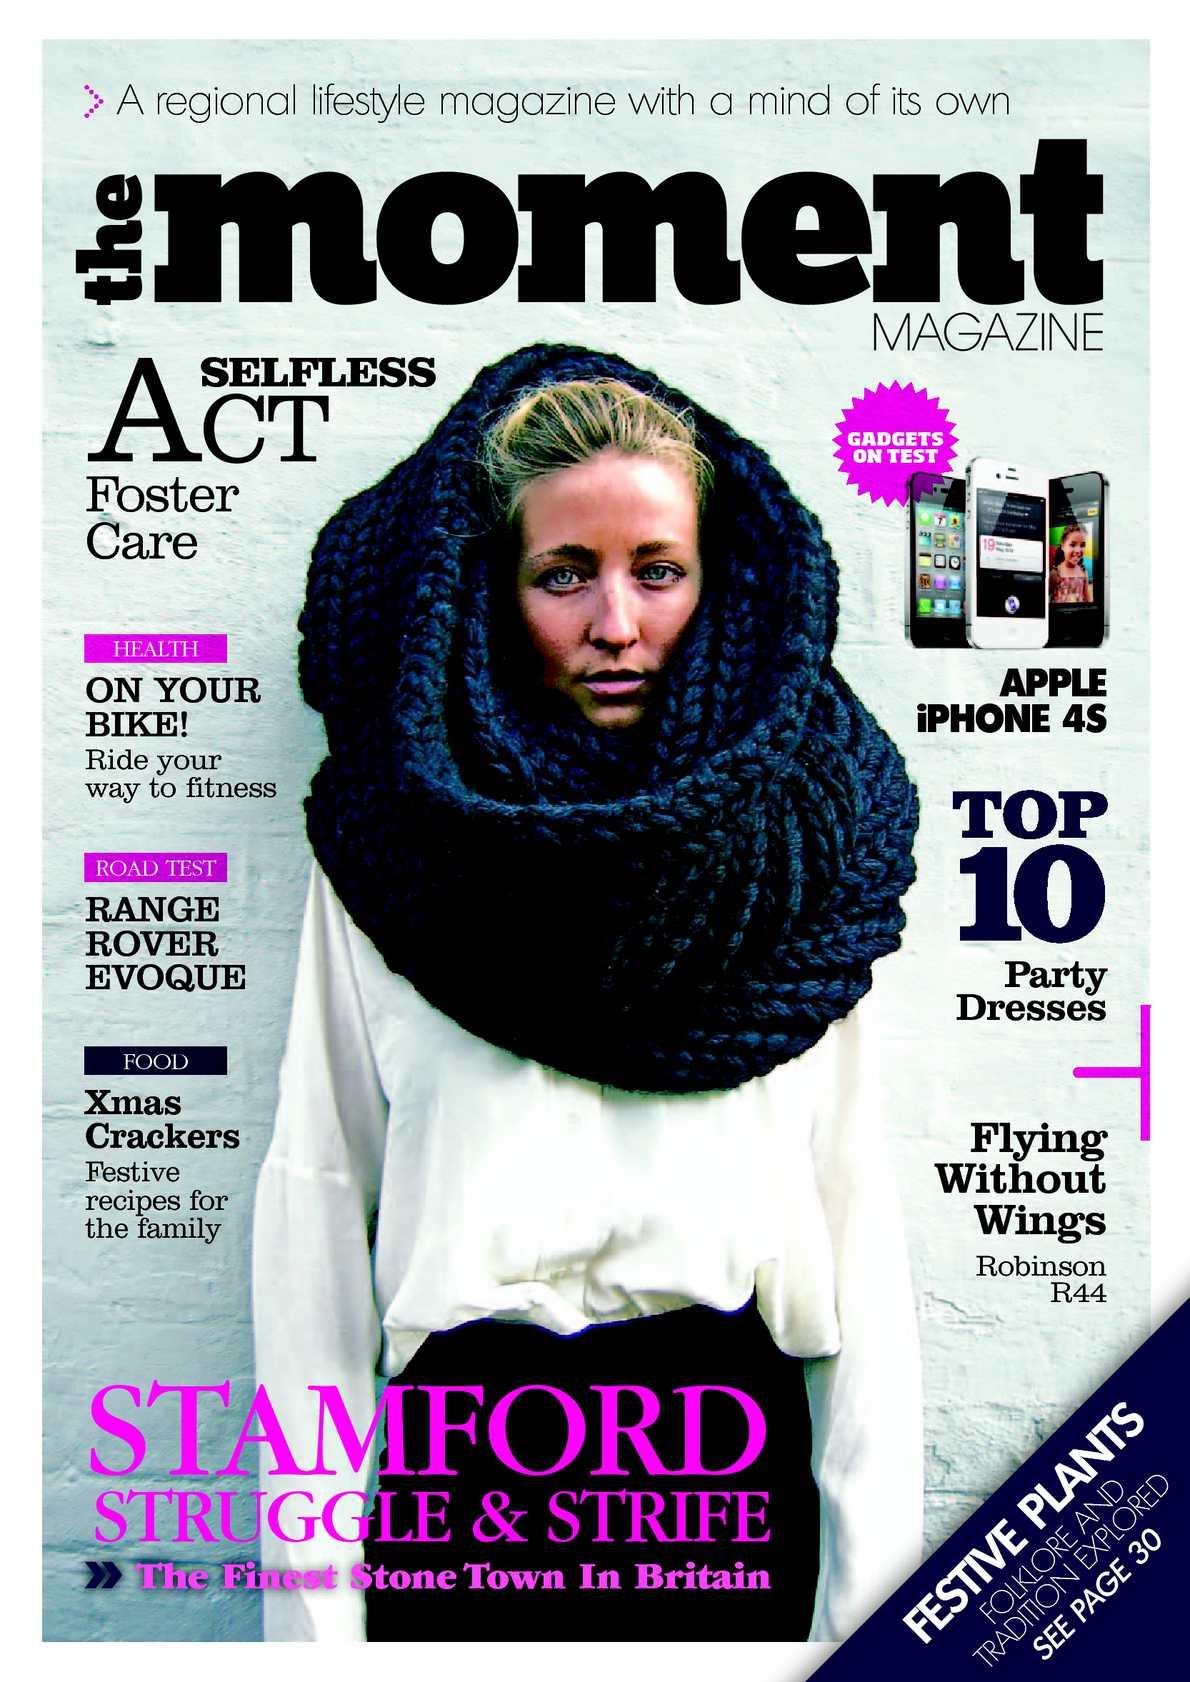 d458017e50916e Calaméo - The Moment Magazine - January 2012 - Issue 7 - FULL EDITION